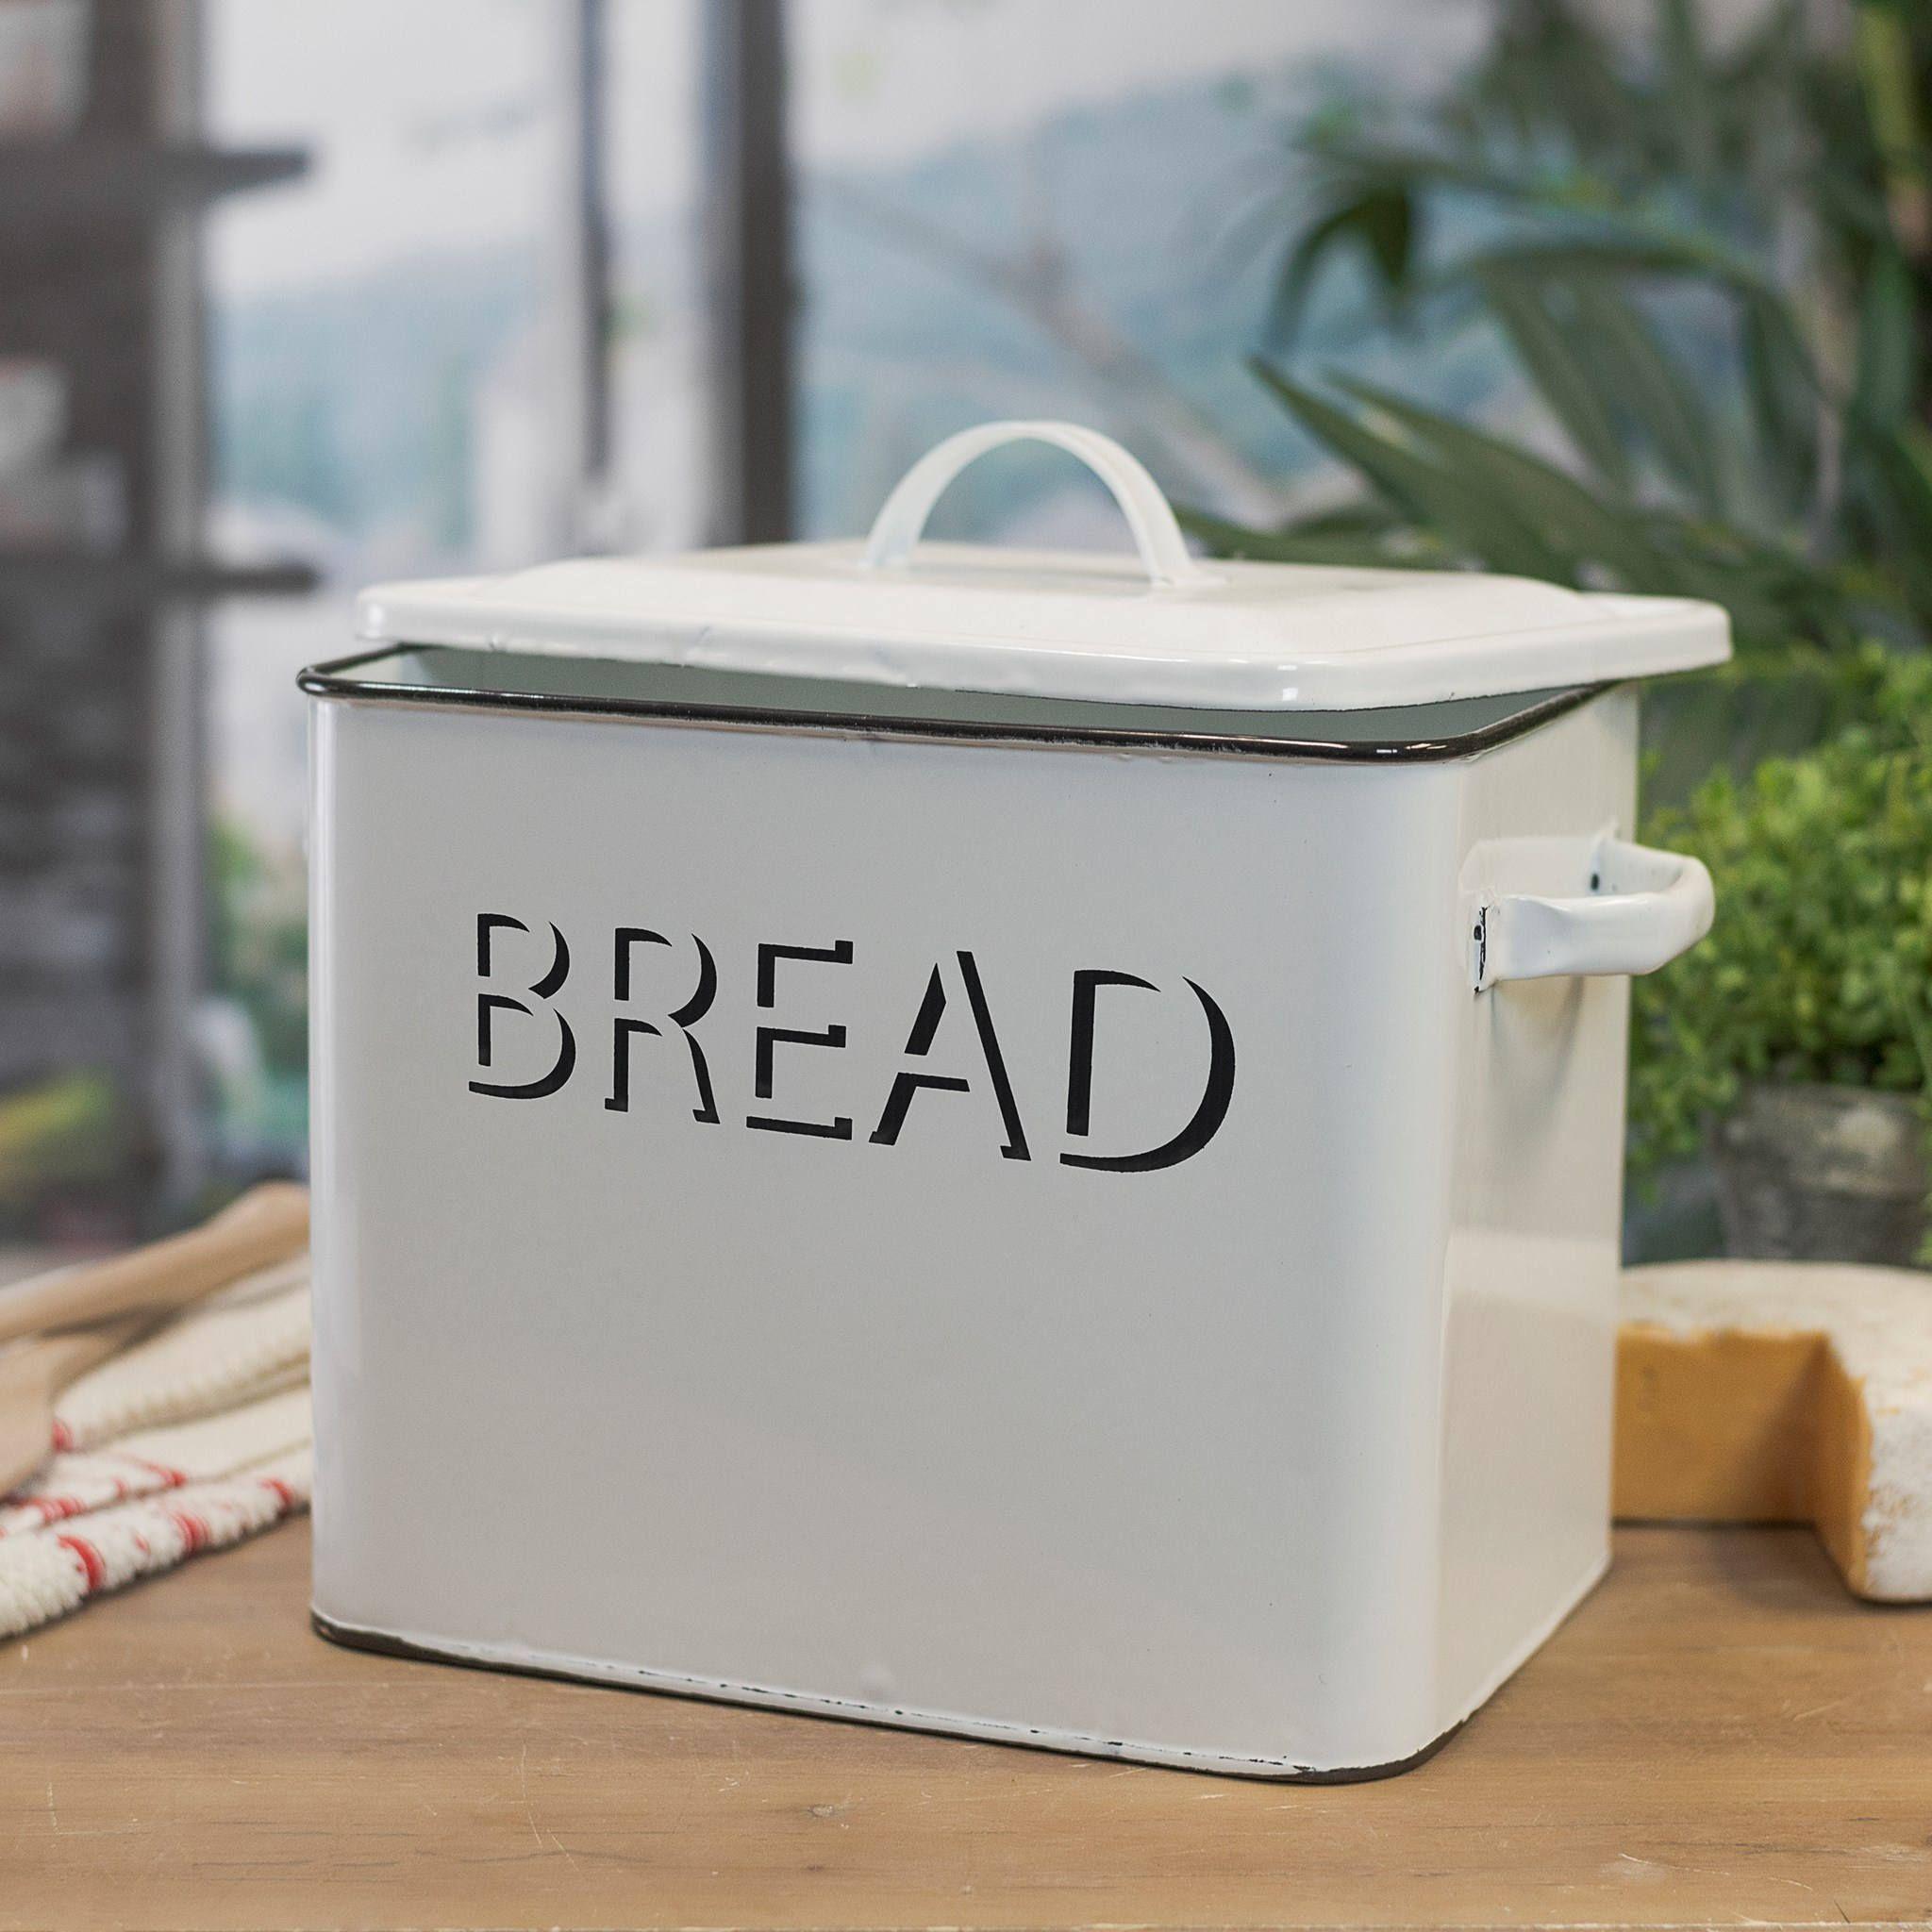 Bread box enamelware with a vintage vibe farmhouse kitchen